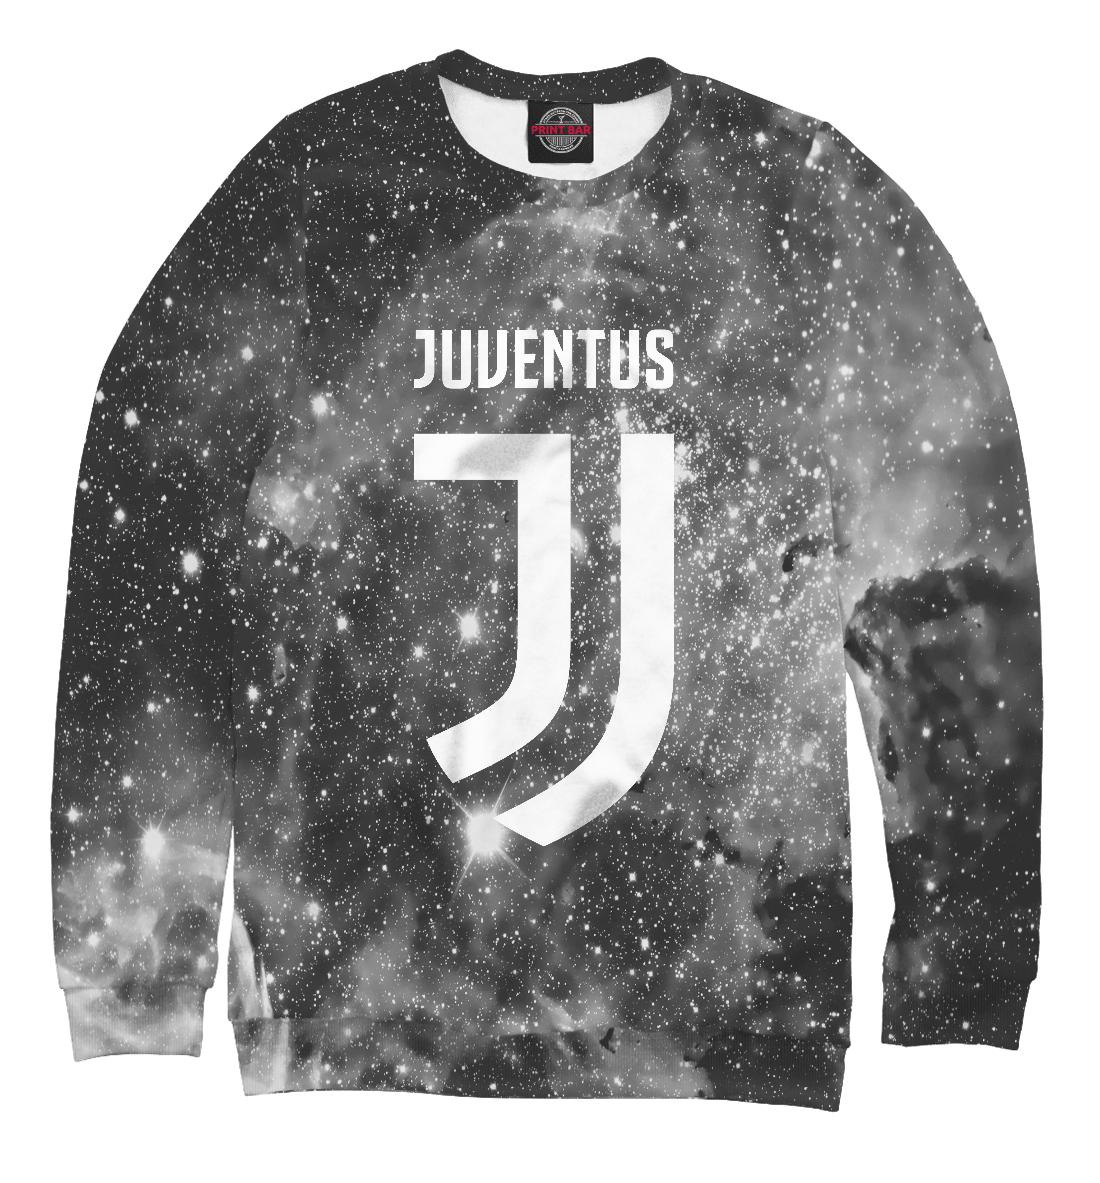 Купить Juventus Cosmos, Printbar, Свитшоты, JUV-556943-swi-1